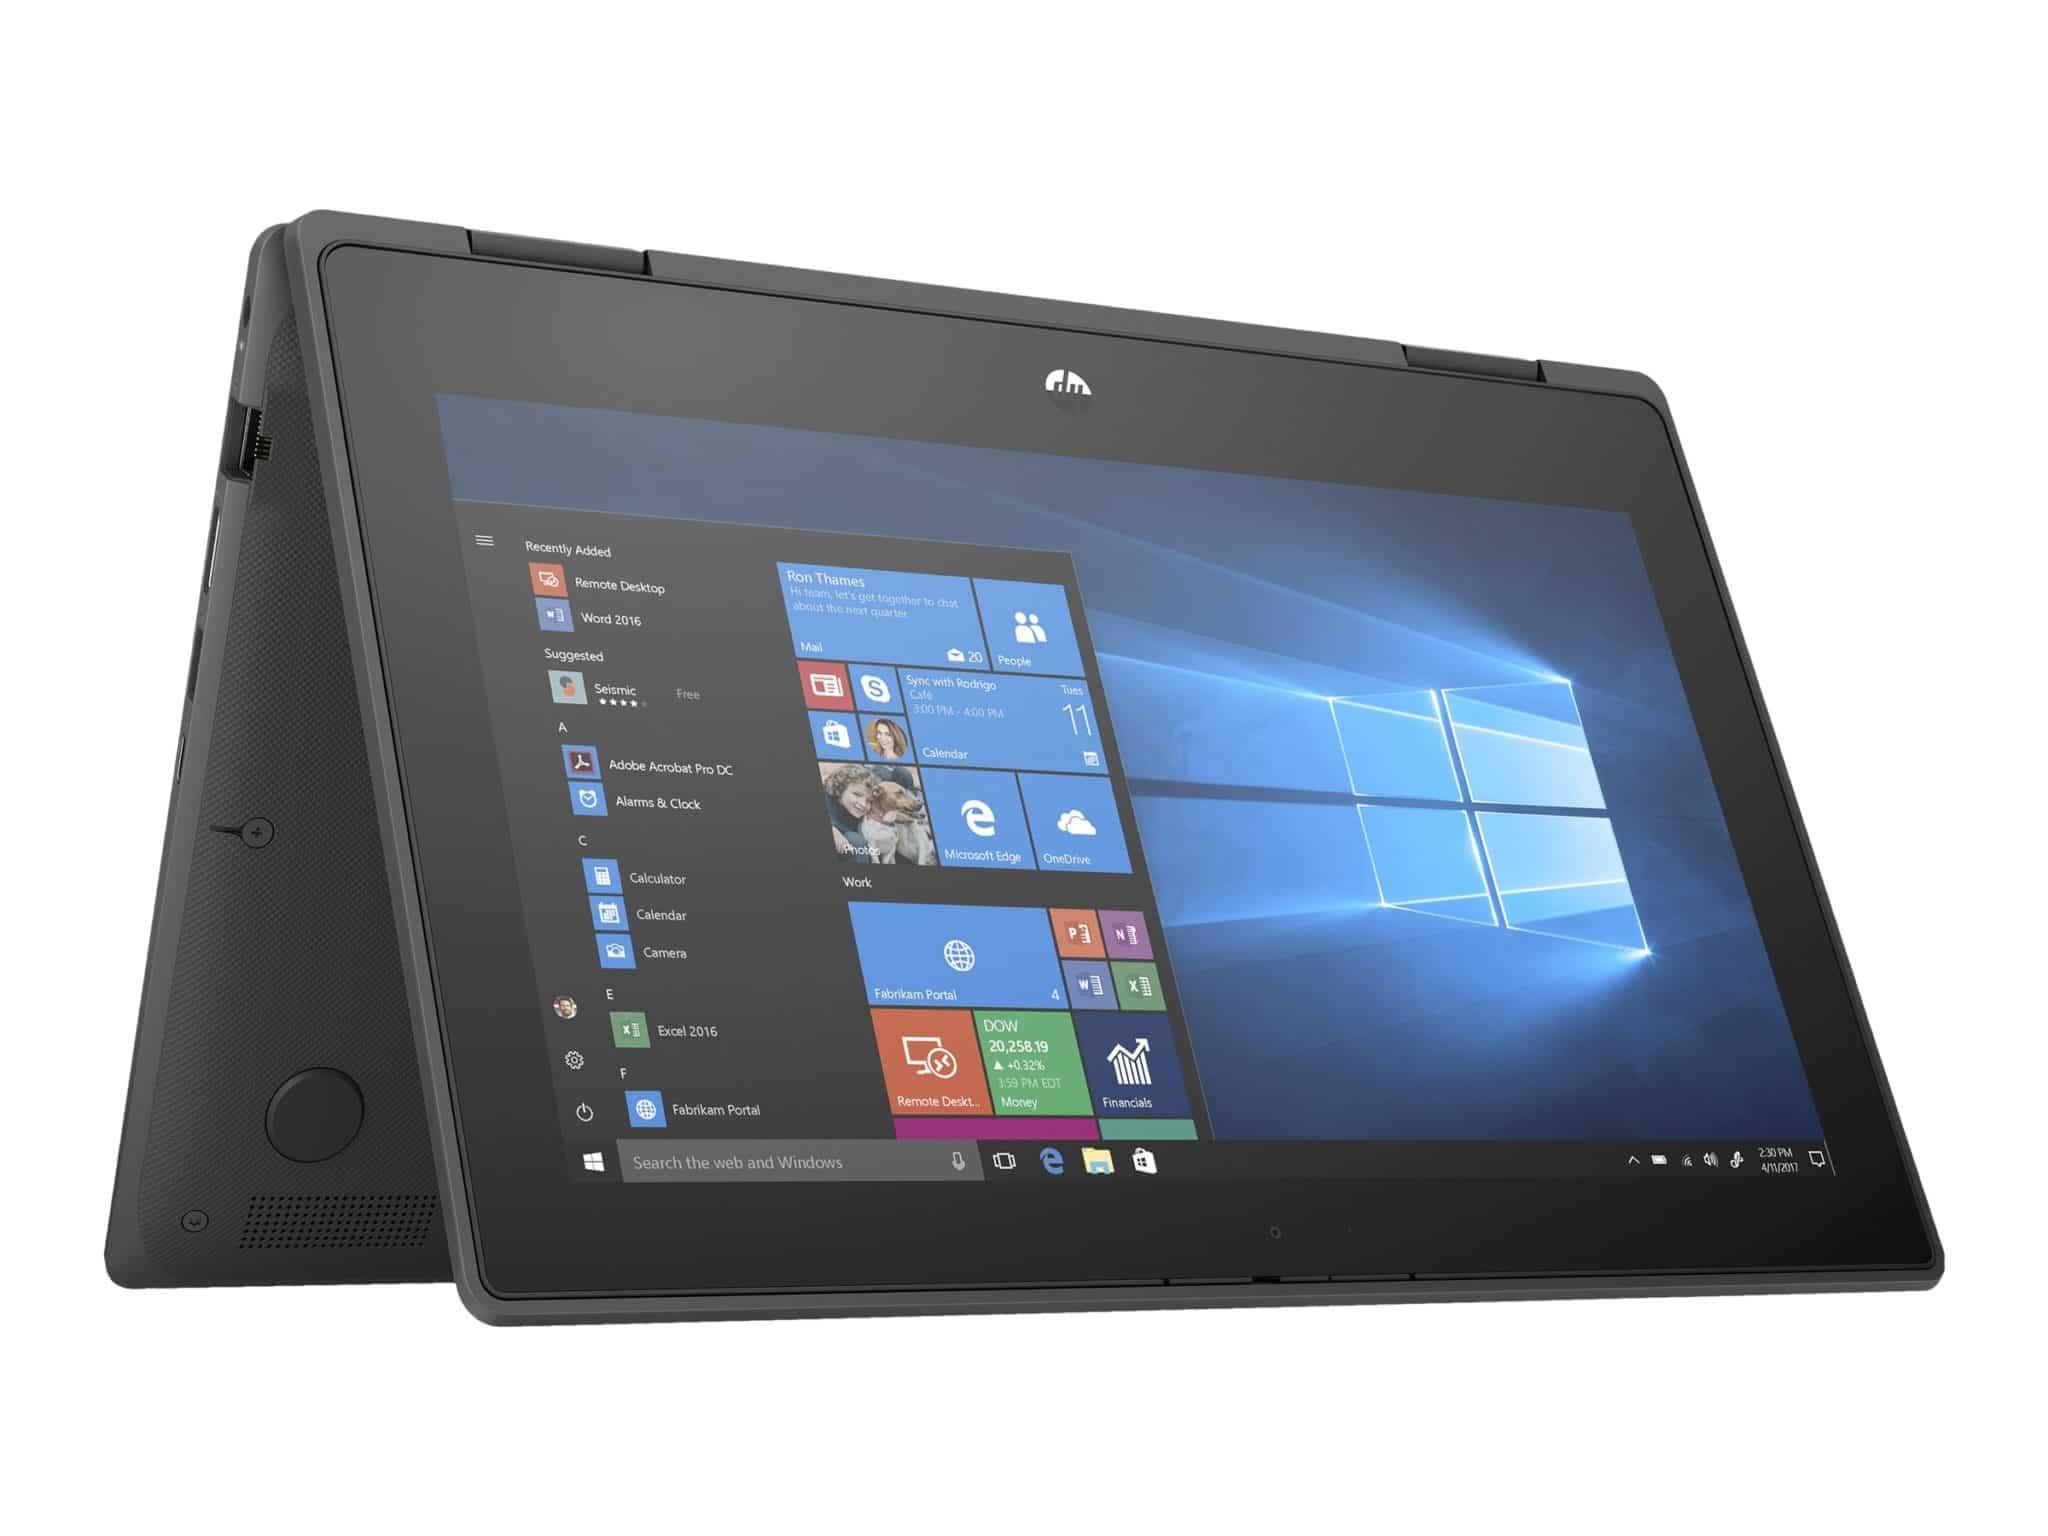 "HP ProBook x360 11 G5 - Education Edition - 11.6"" - Pentium Silver N5030 - 4 GB RAM - 128 GB SSD - Notebook"